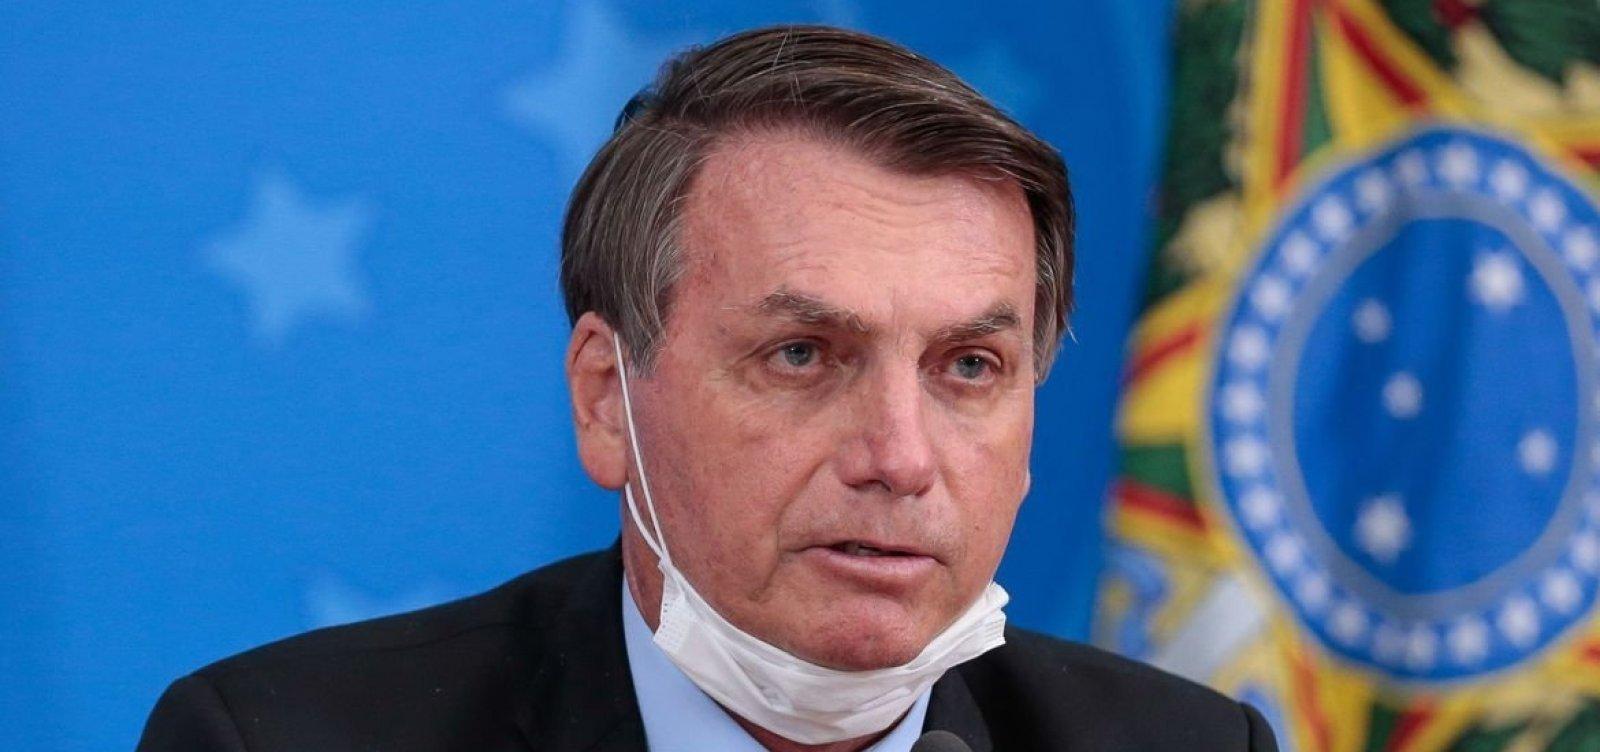 [Bolsonaro usa enquete on-line para criticar uso de máscaras; cientistas questionam a pesquisa]